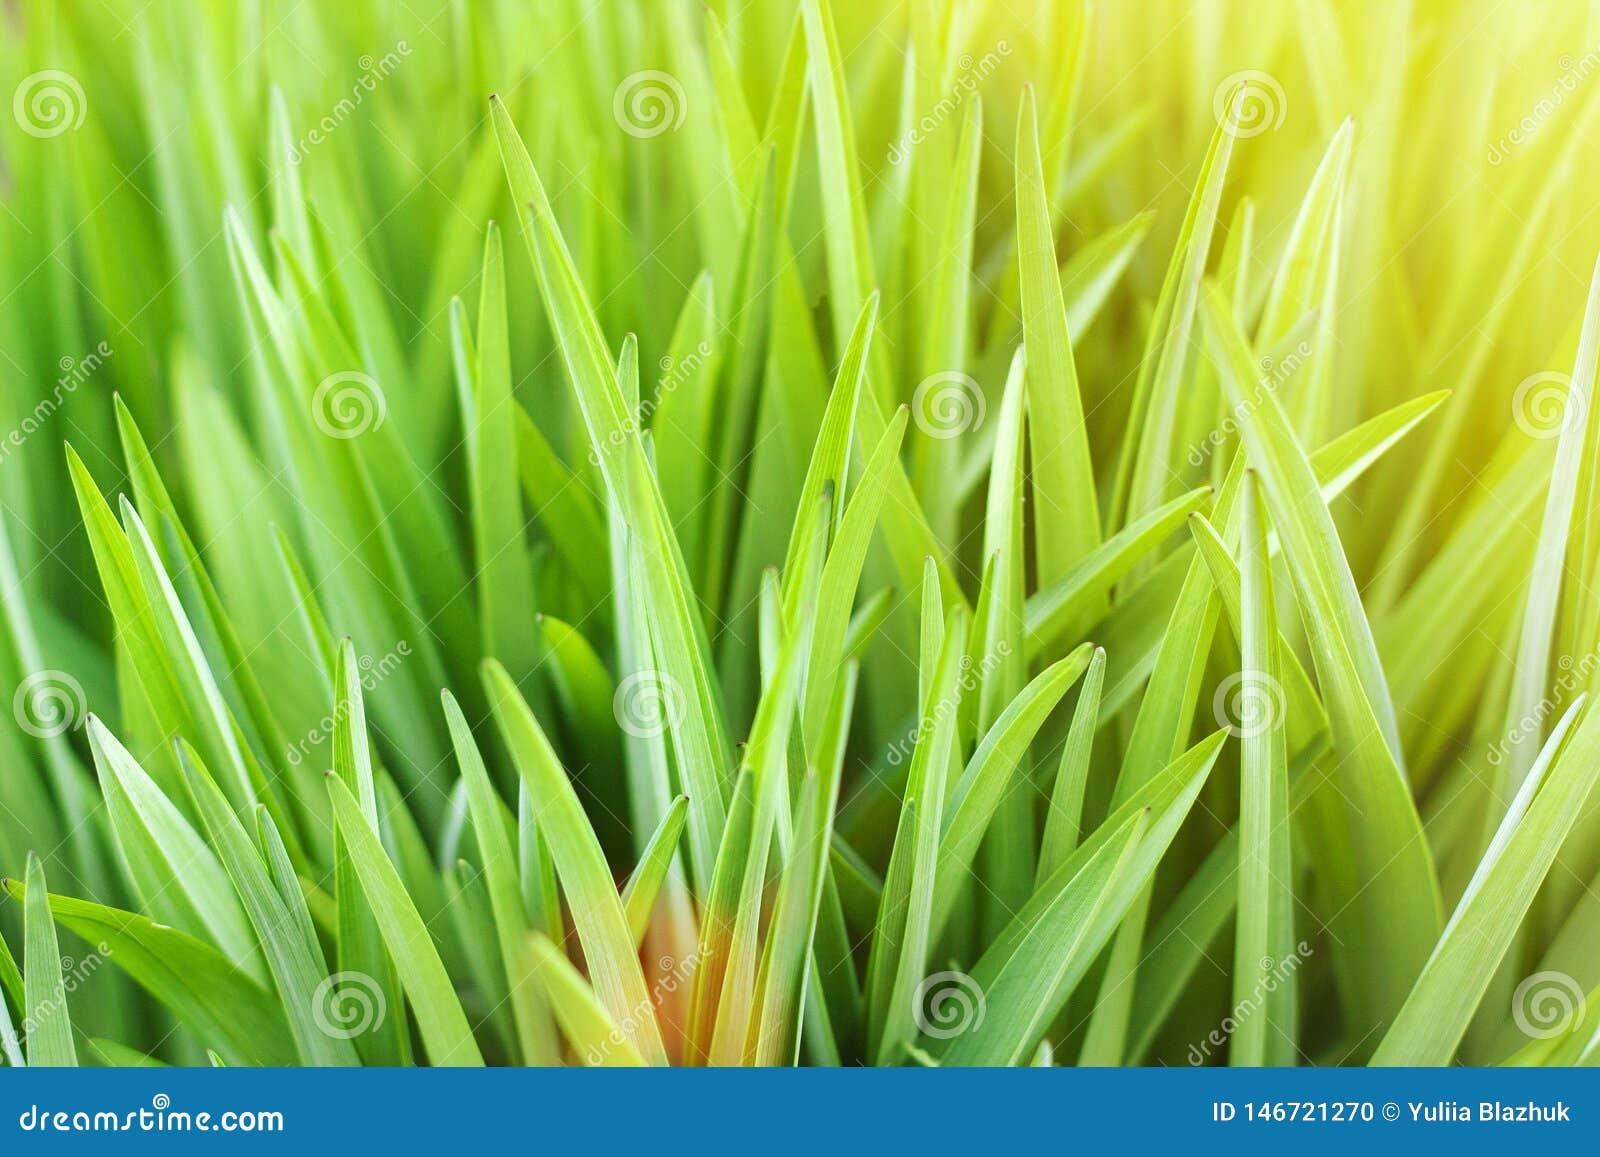 Fundo borrado natural do verde ensolarado do sum?rio